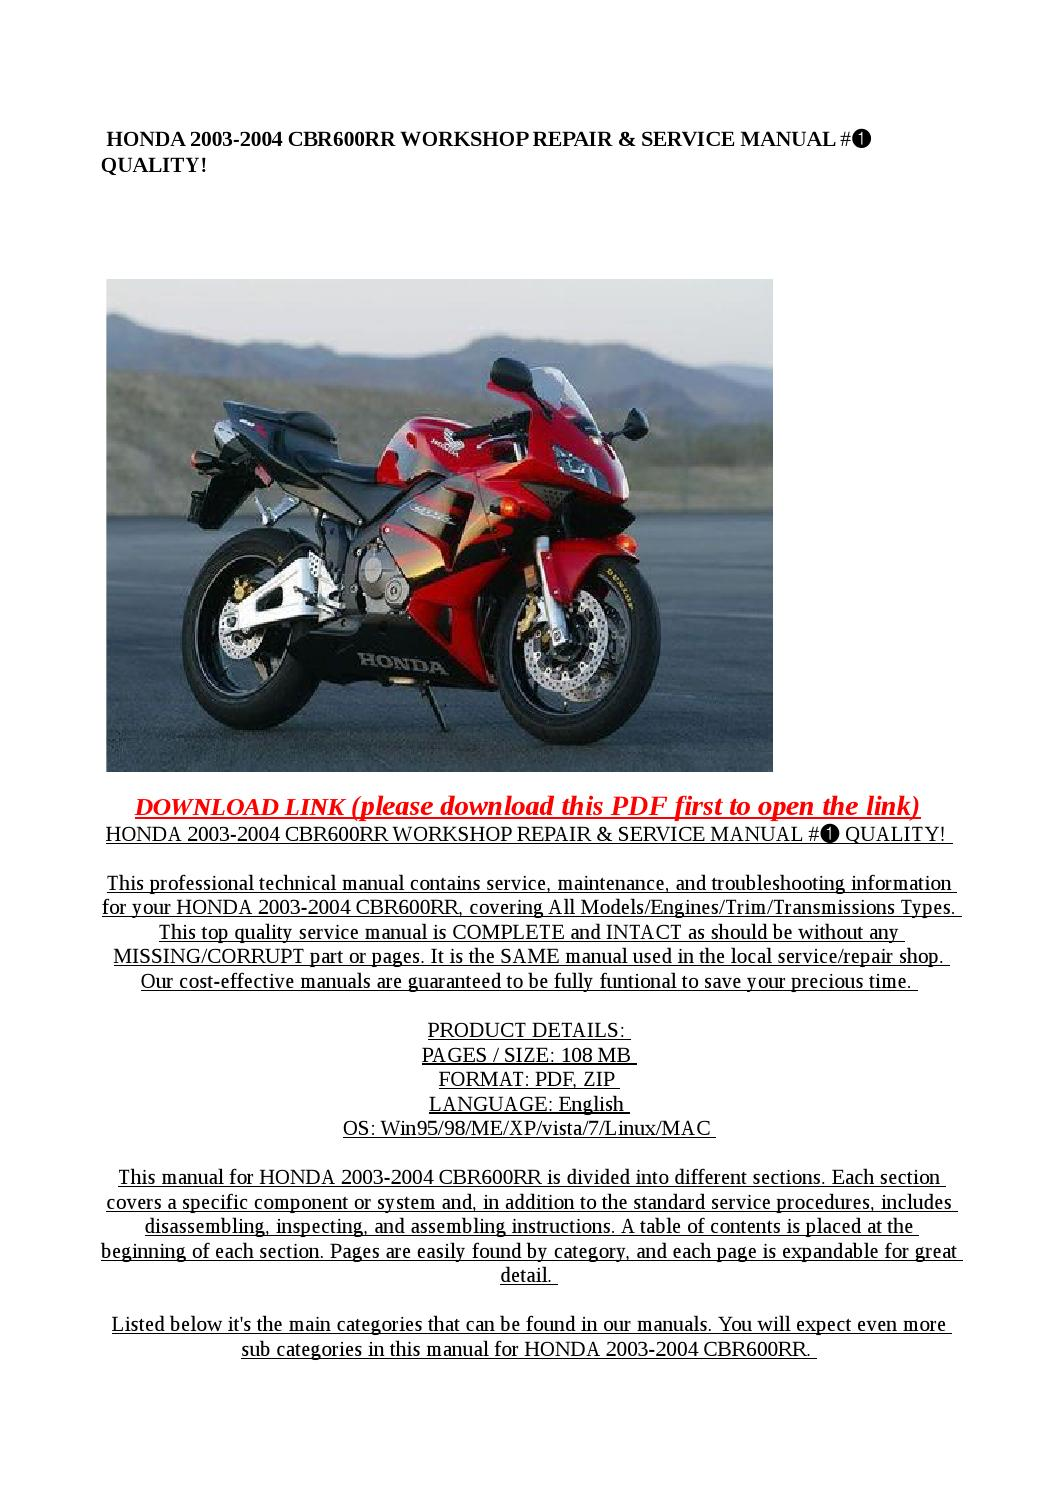 2010 honda cbr600rr service manual